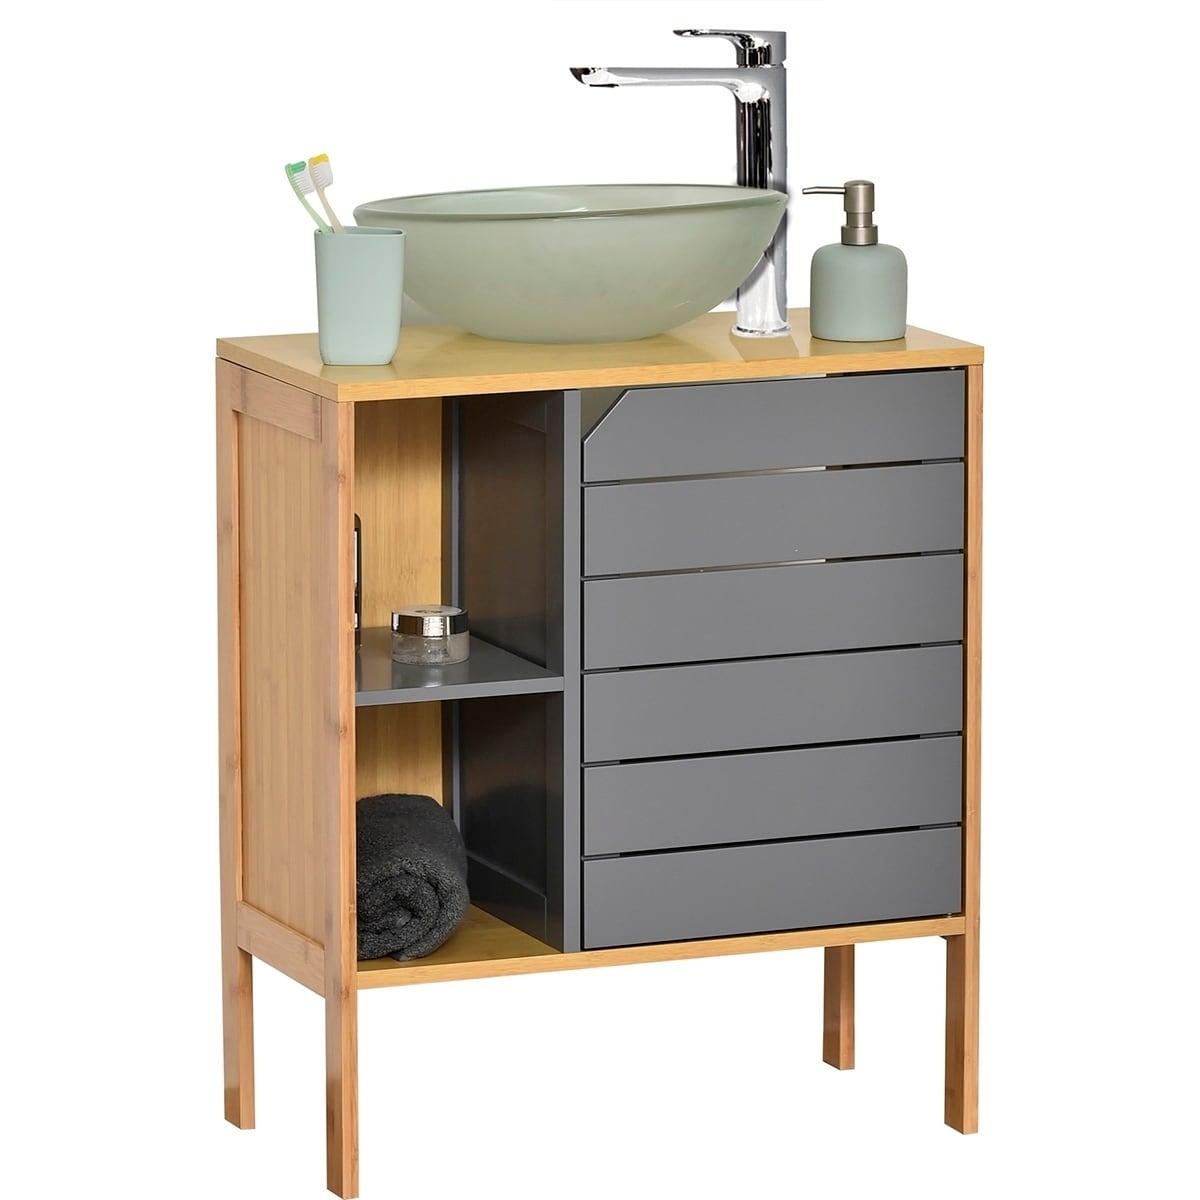 Shop Non Pedestal Under Sink Storage Vanity Cabinet Bath Brown Gray Noumea Overstock 30805888,Rudolph The Red Nosed Reindeer The Movie Villains